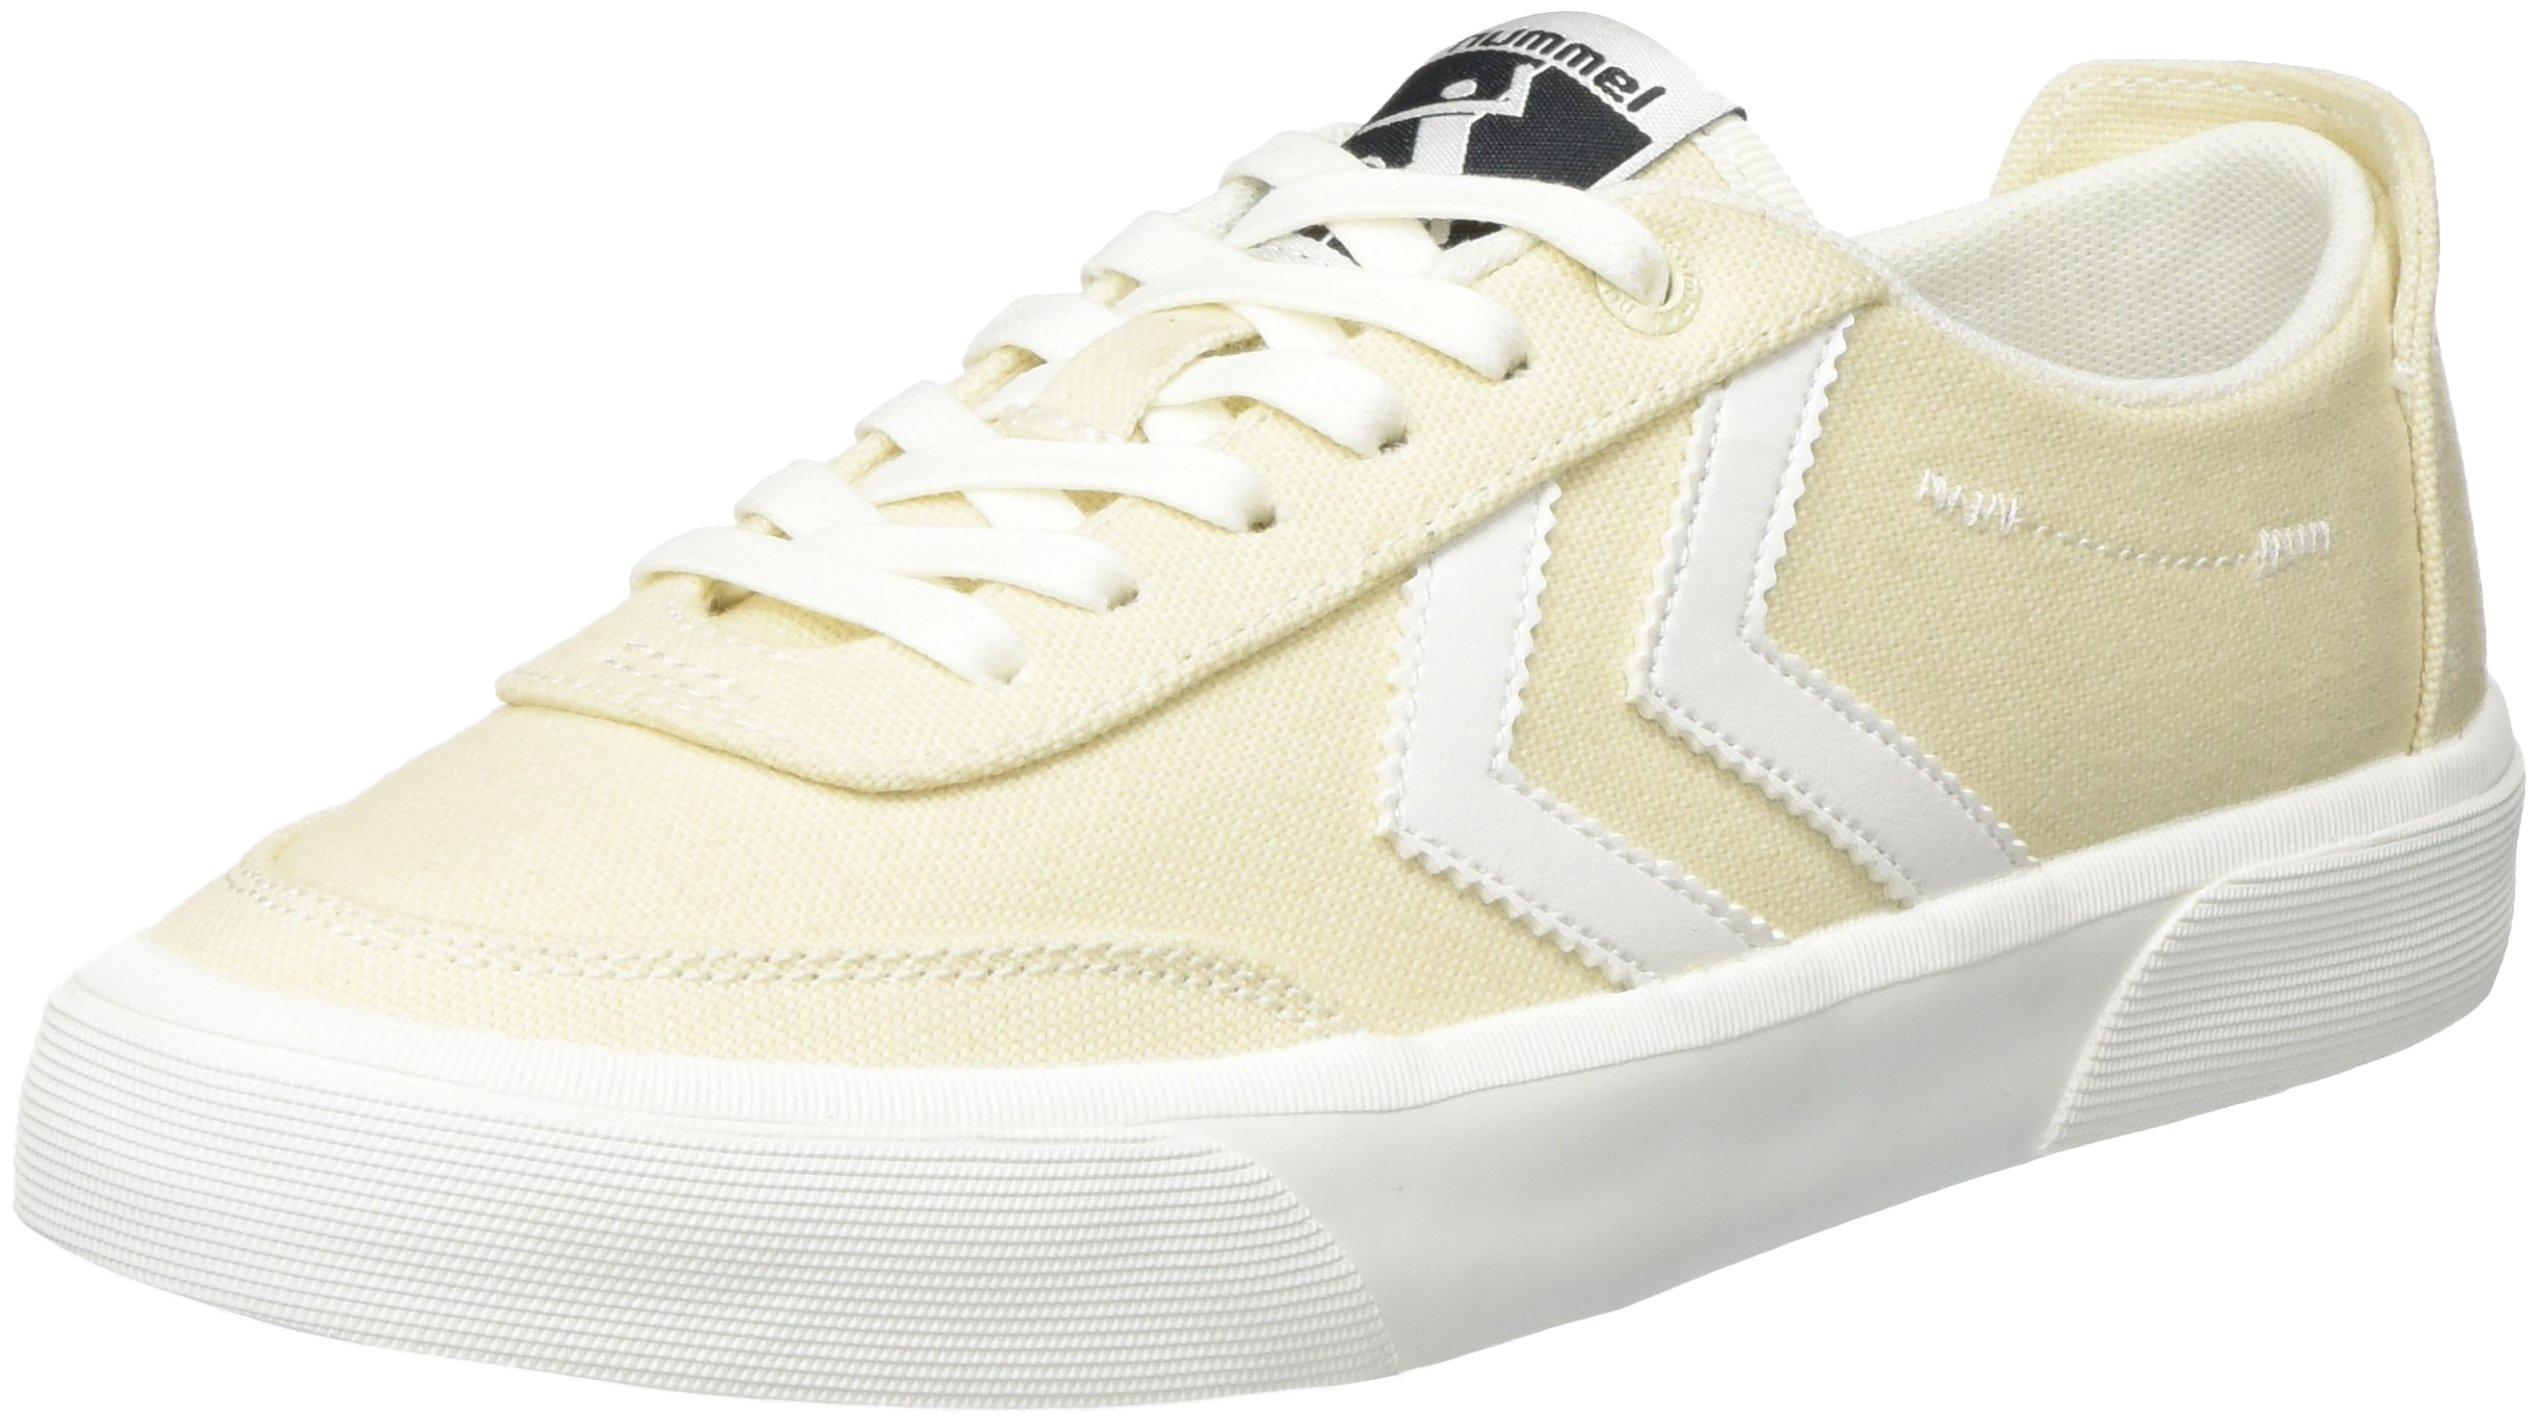 Hummel AdulteBlancpristine Eu Summer White44 Stockholm LowSneakers Mixte Basses rdtshxQC